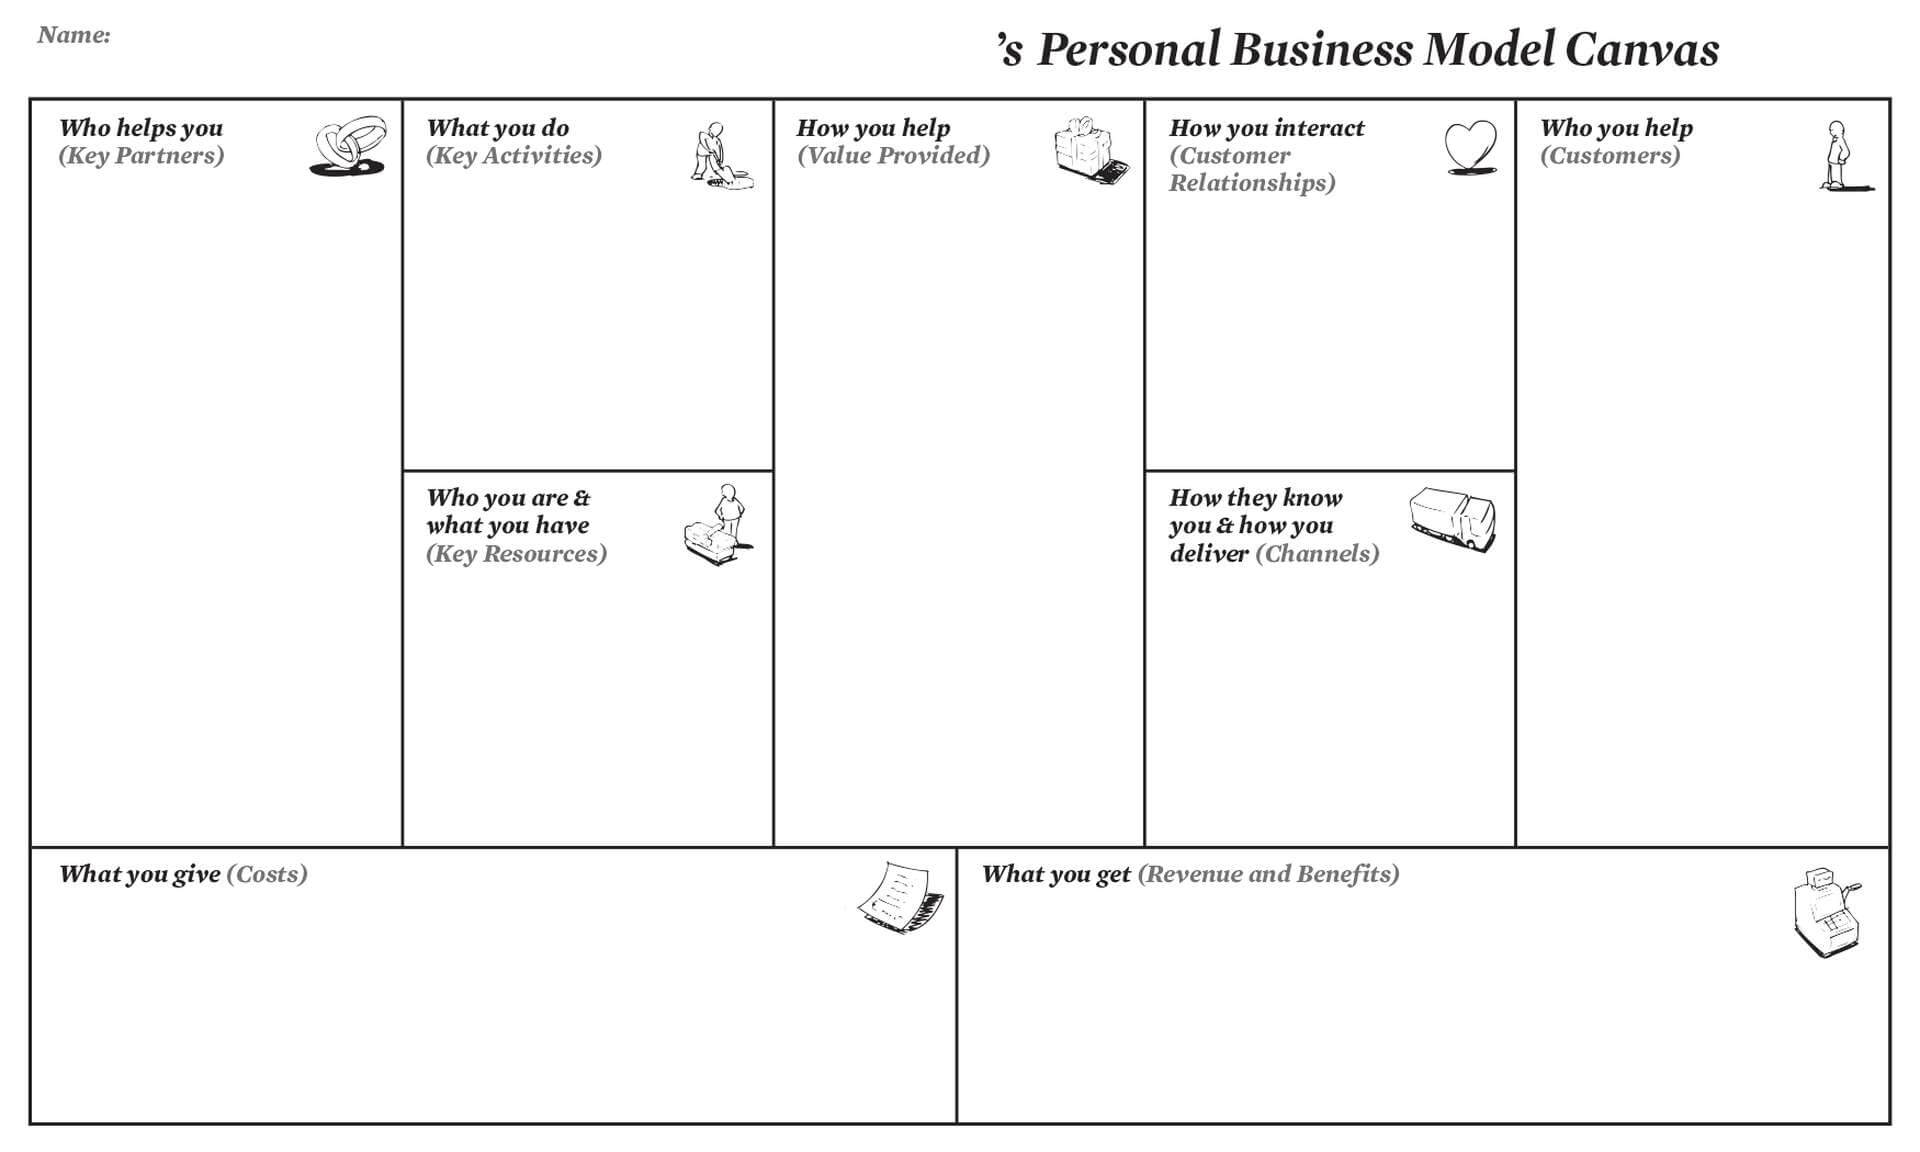 Personal Business Model Canvas | Creatlr Pertaining To Business Model Canvas Template Word